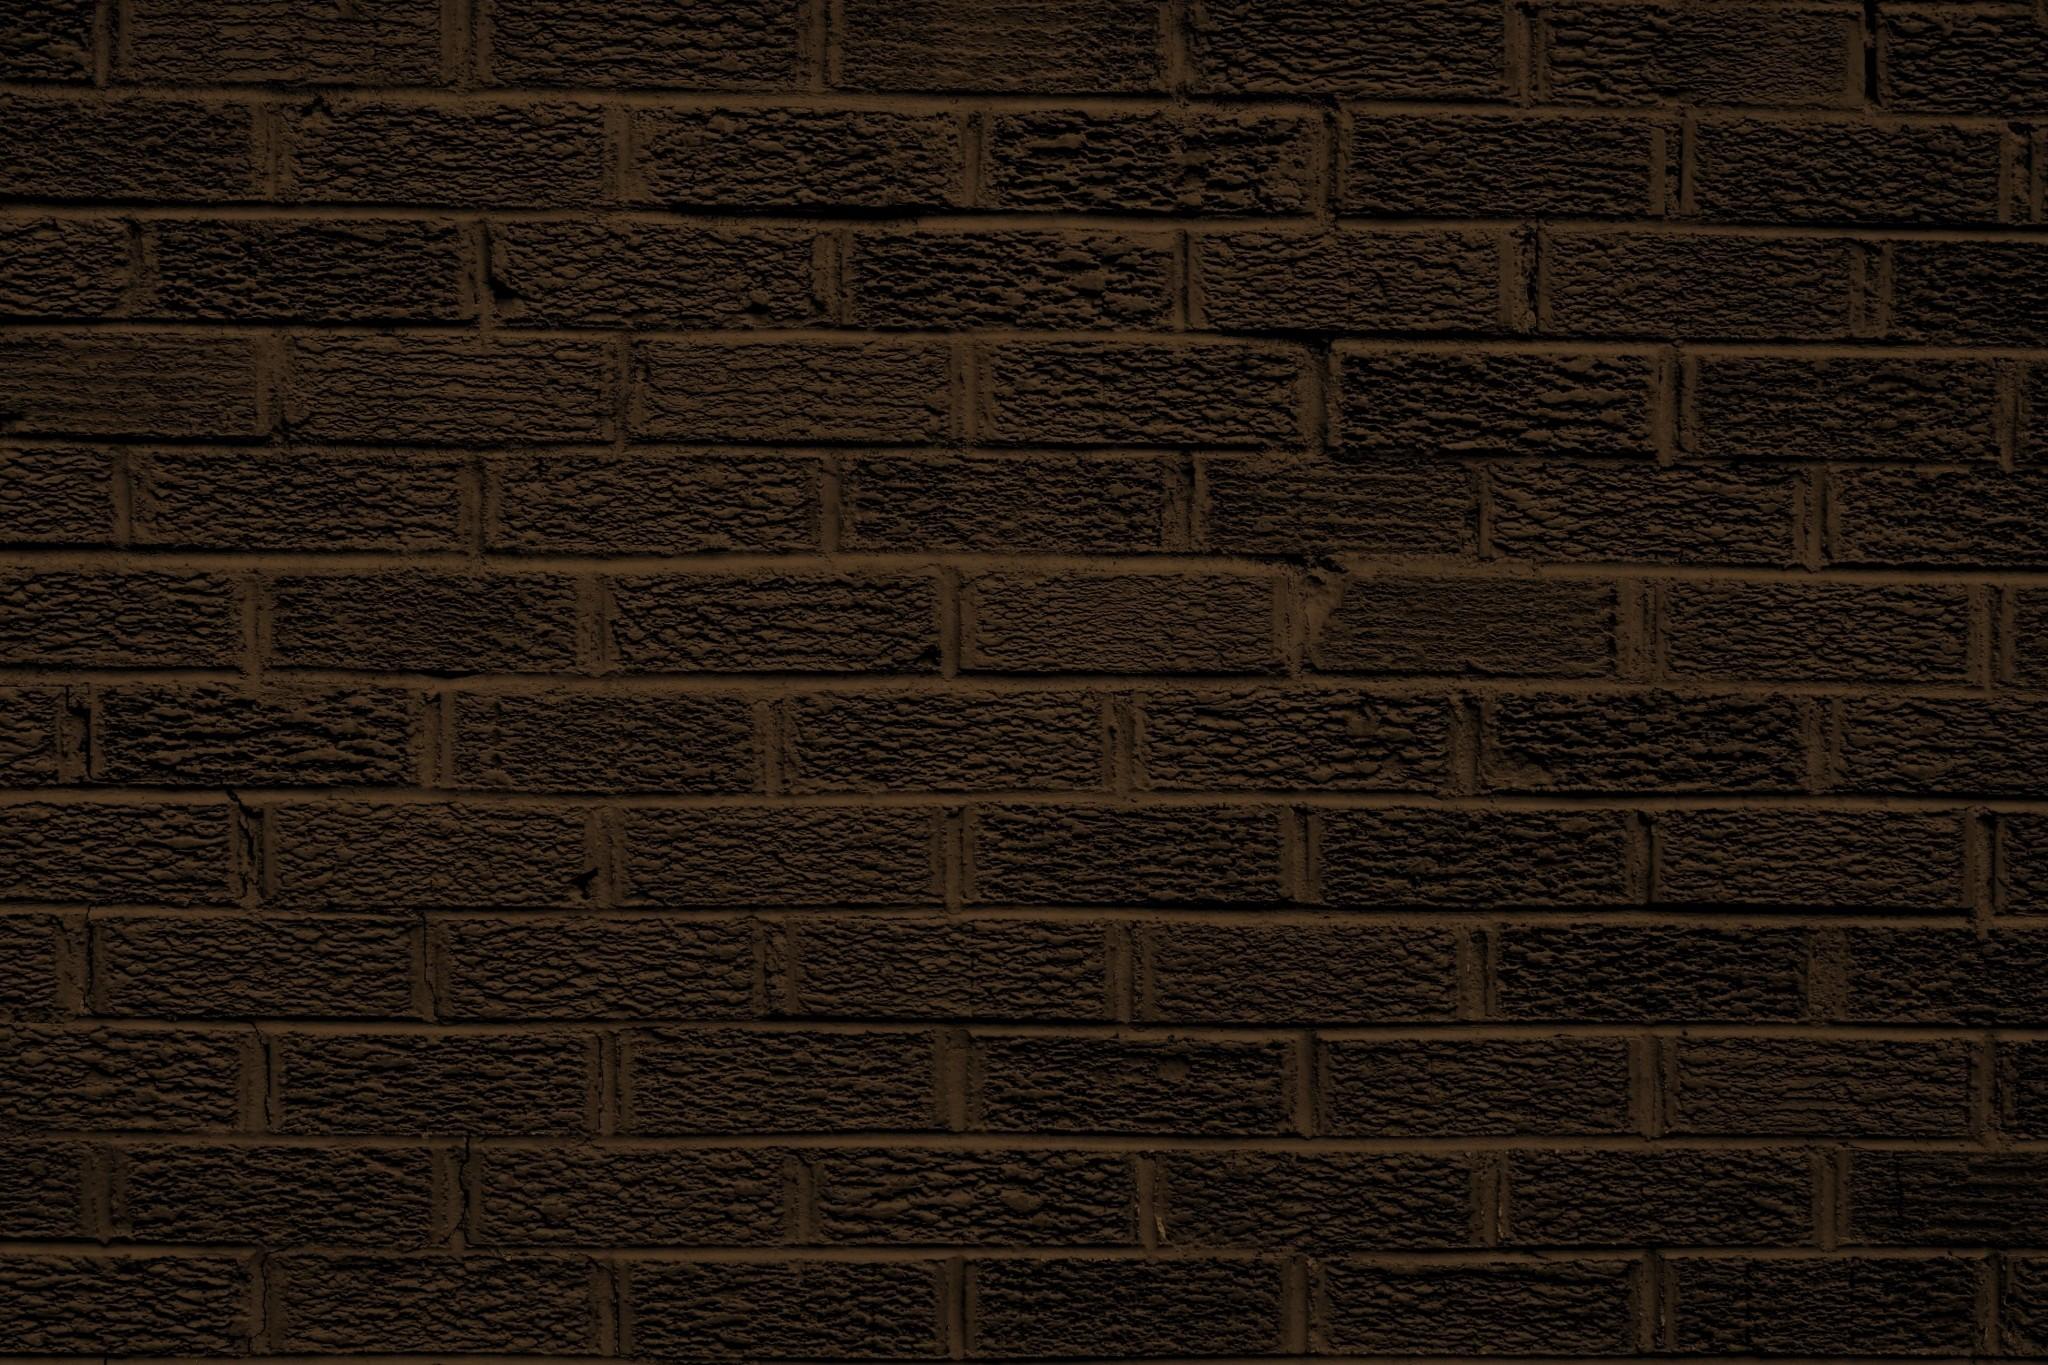 brick windows backgrounds